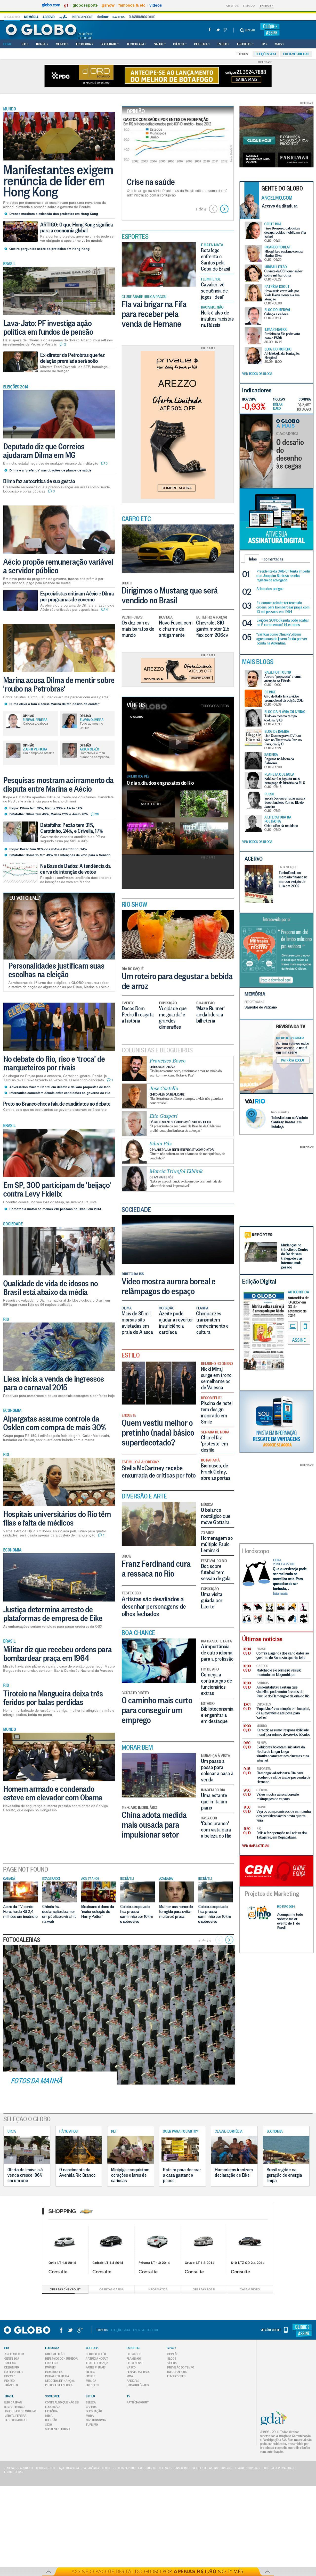 O Globo at Wednesday Oct. 1, 2014, 1:05 p.m. UTC